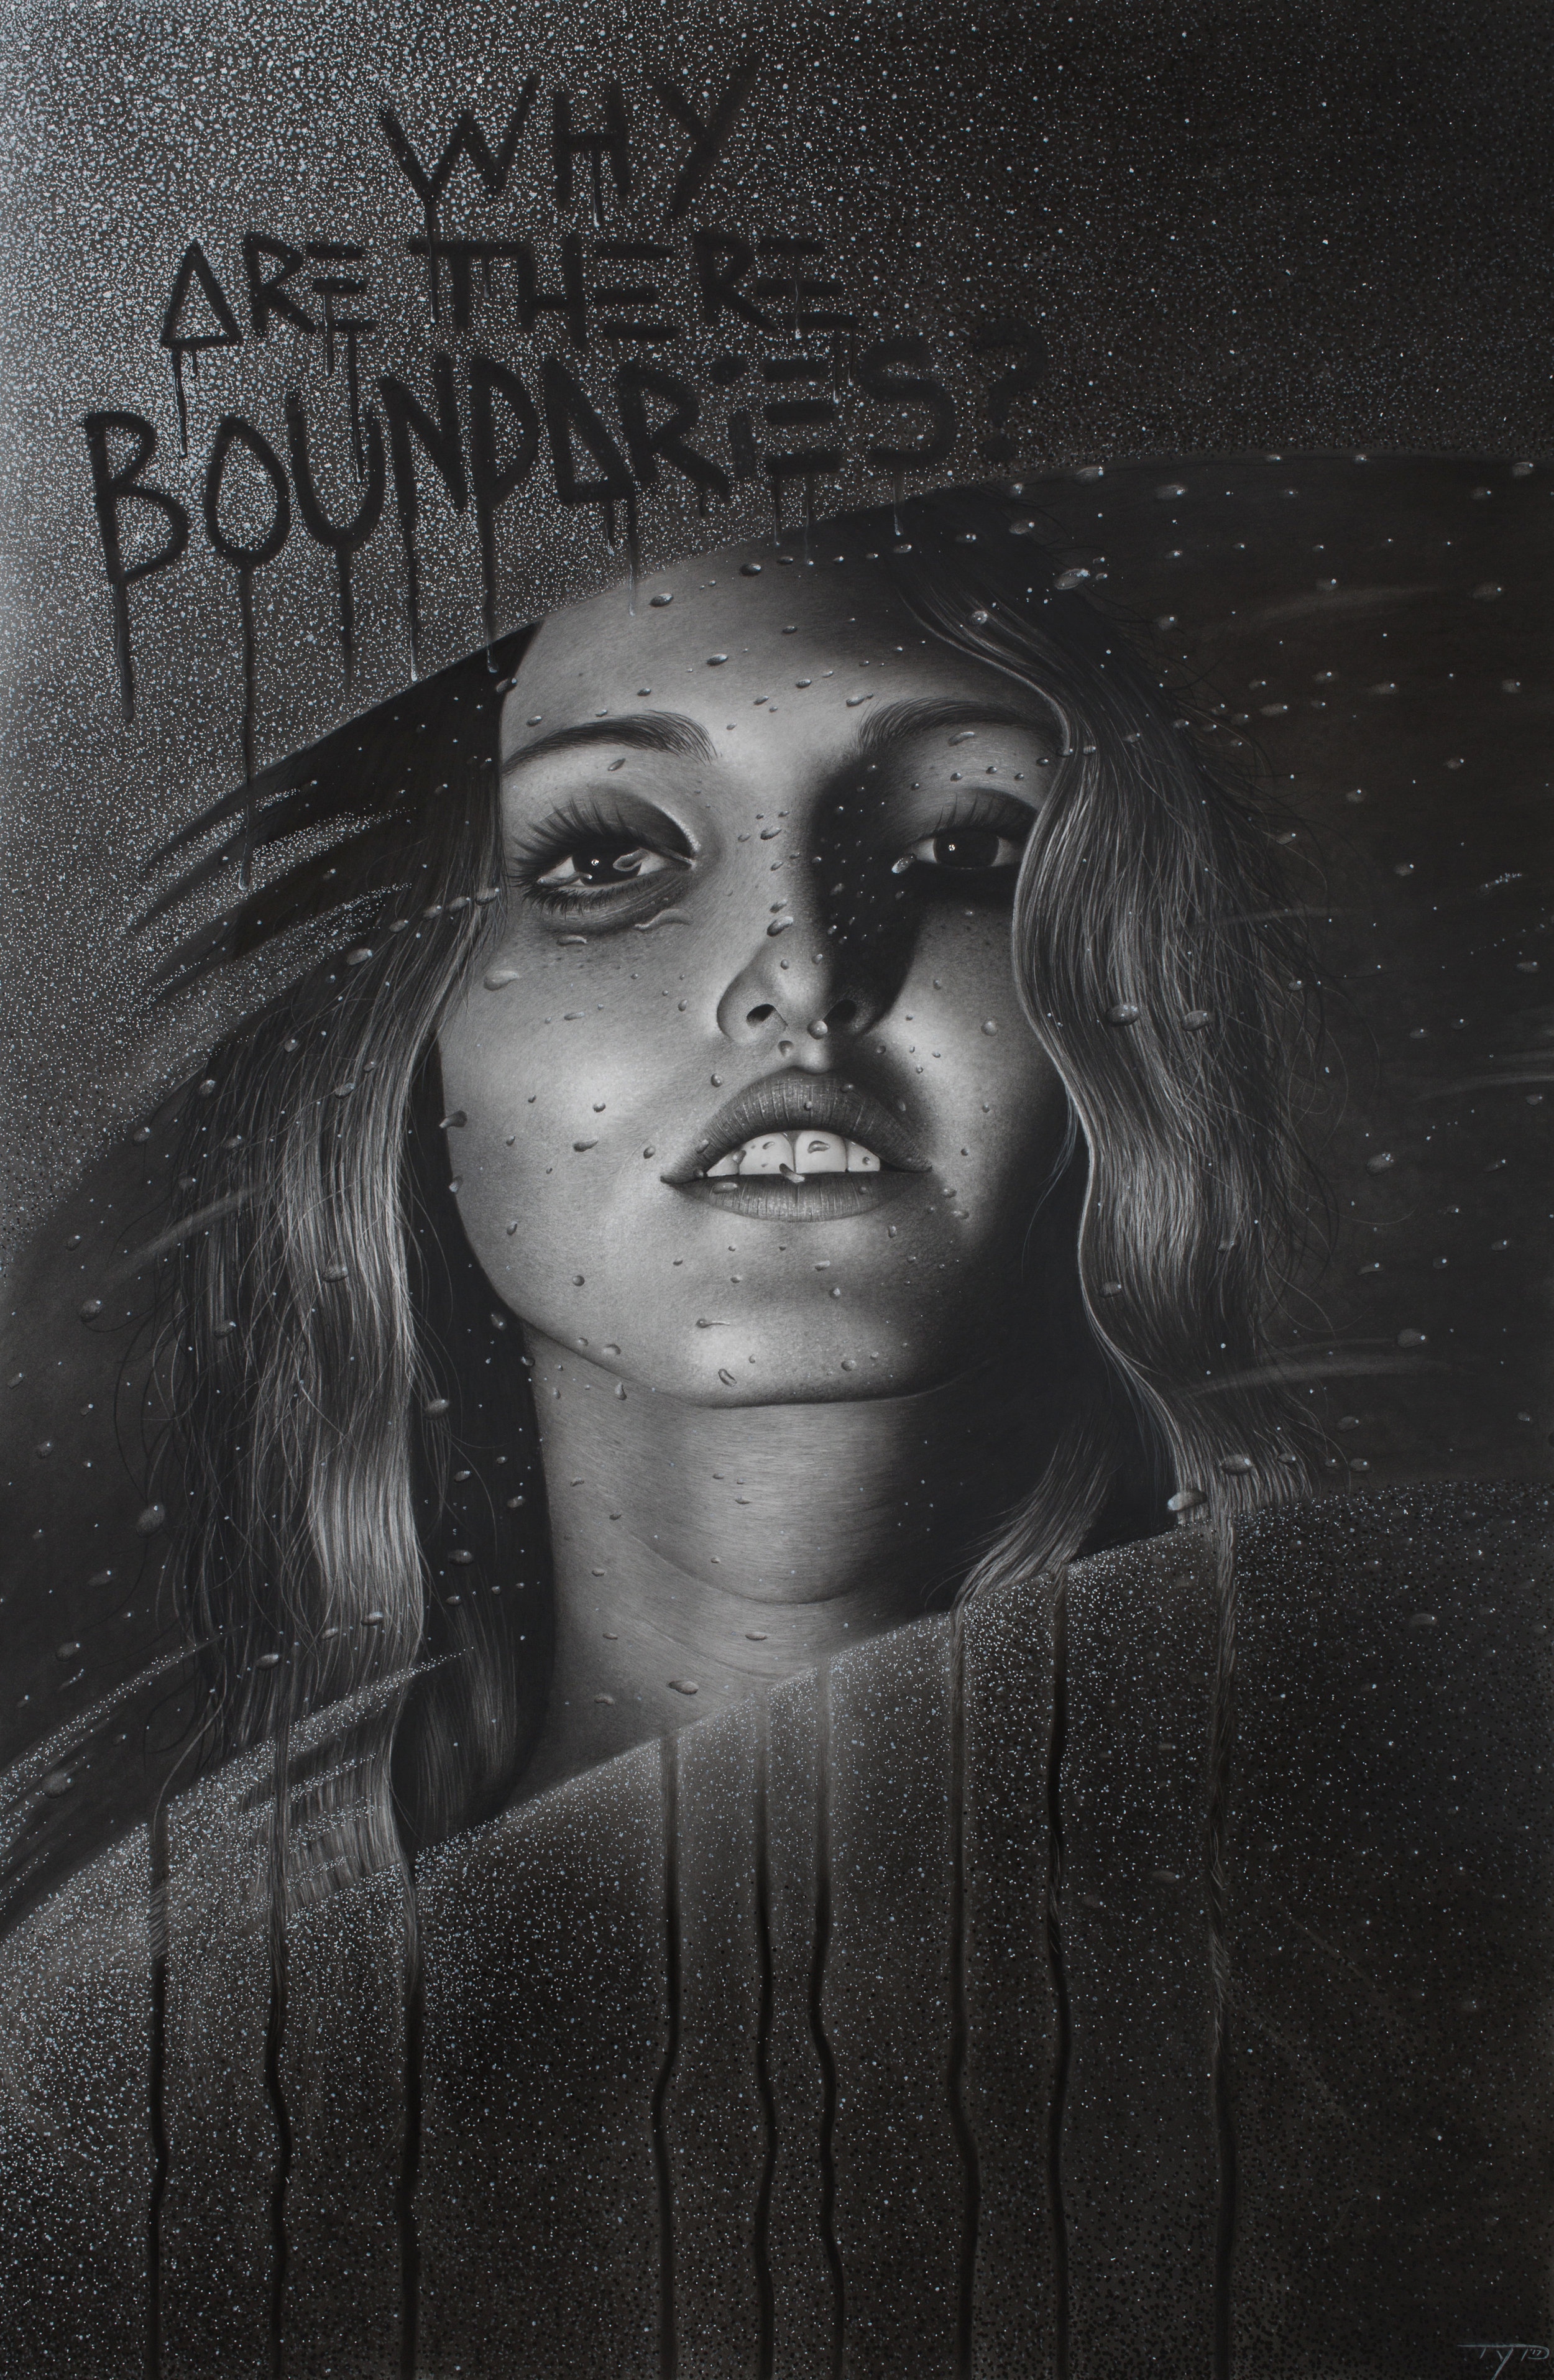 BoundariesFINAL.jpg